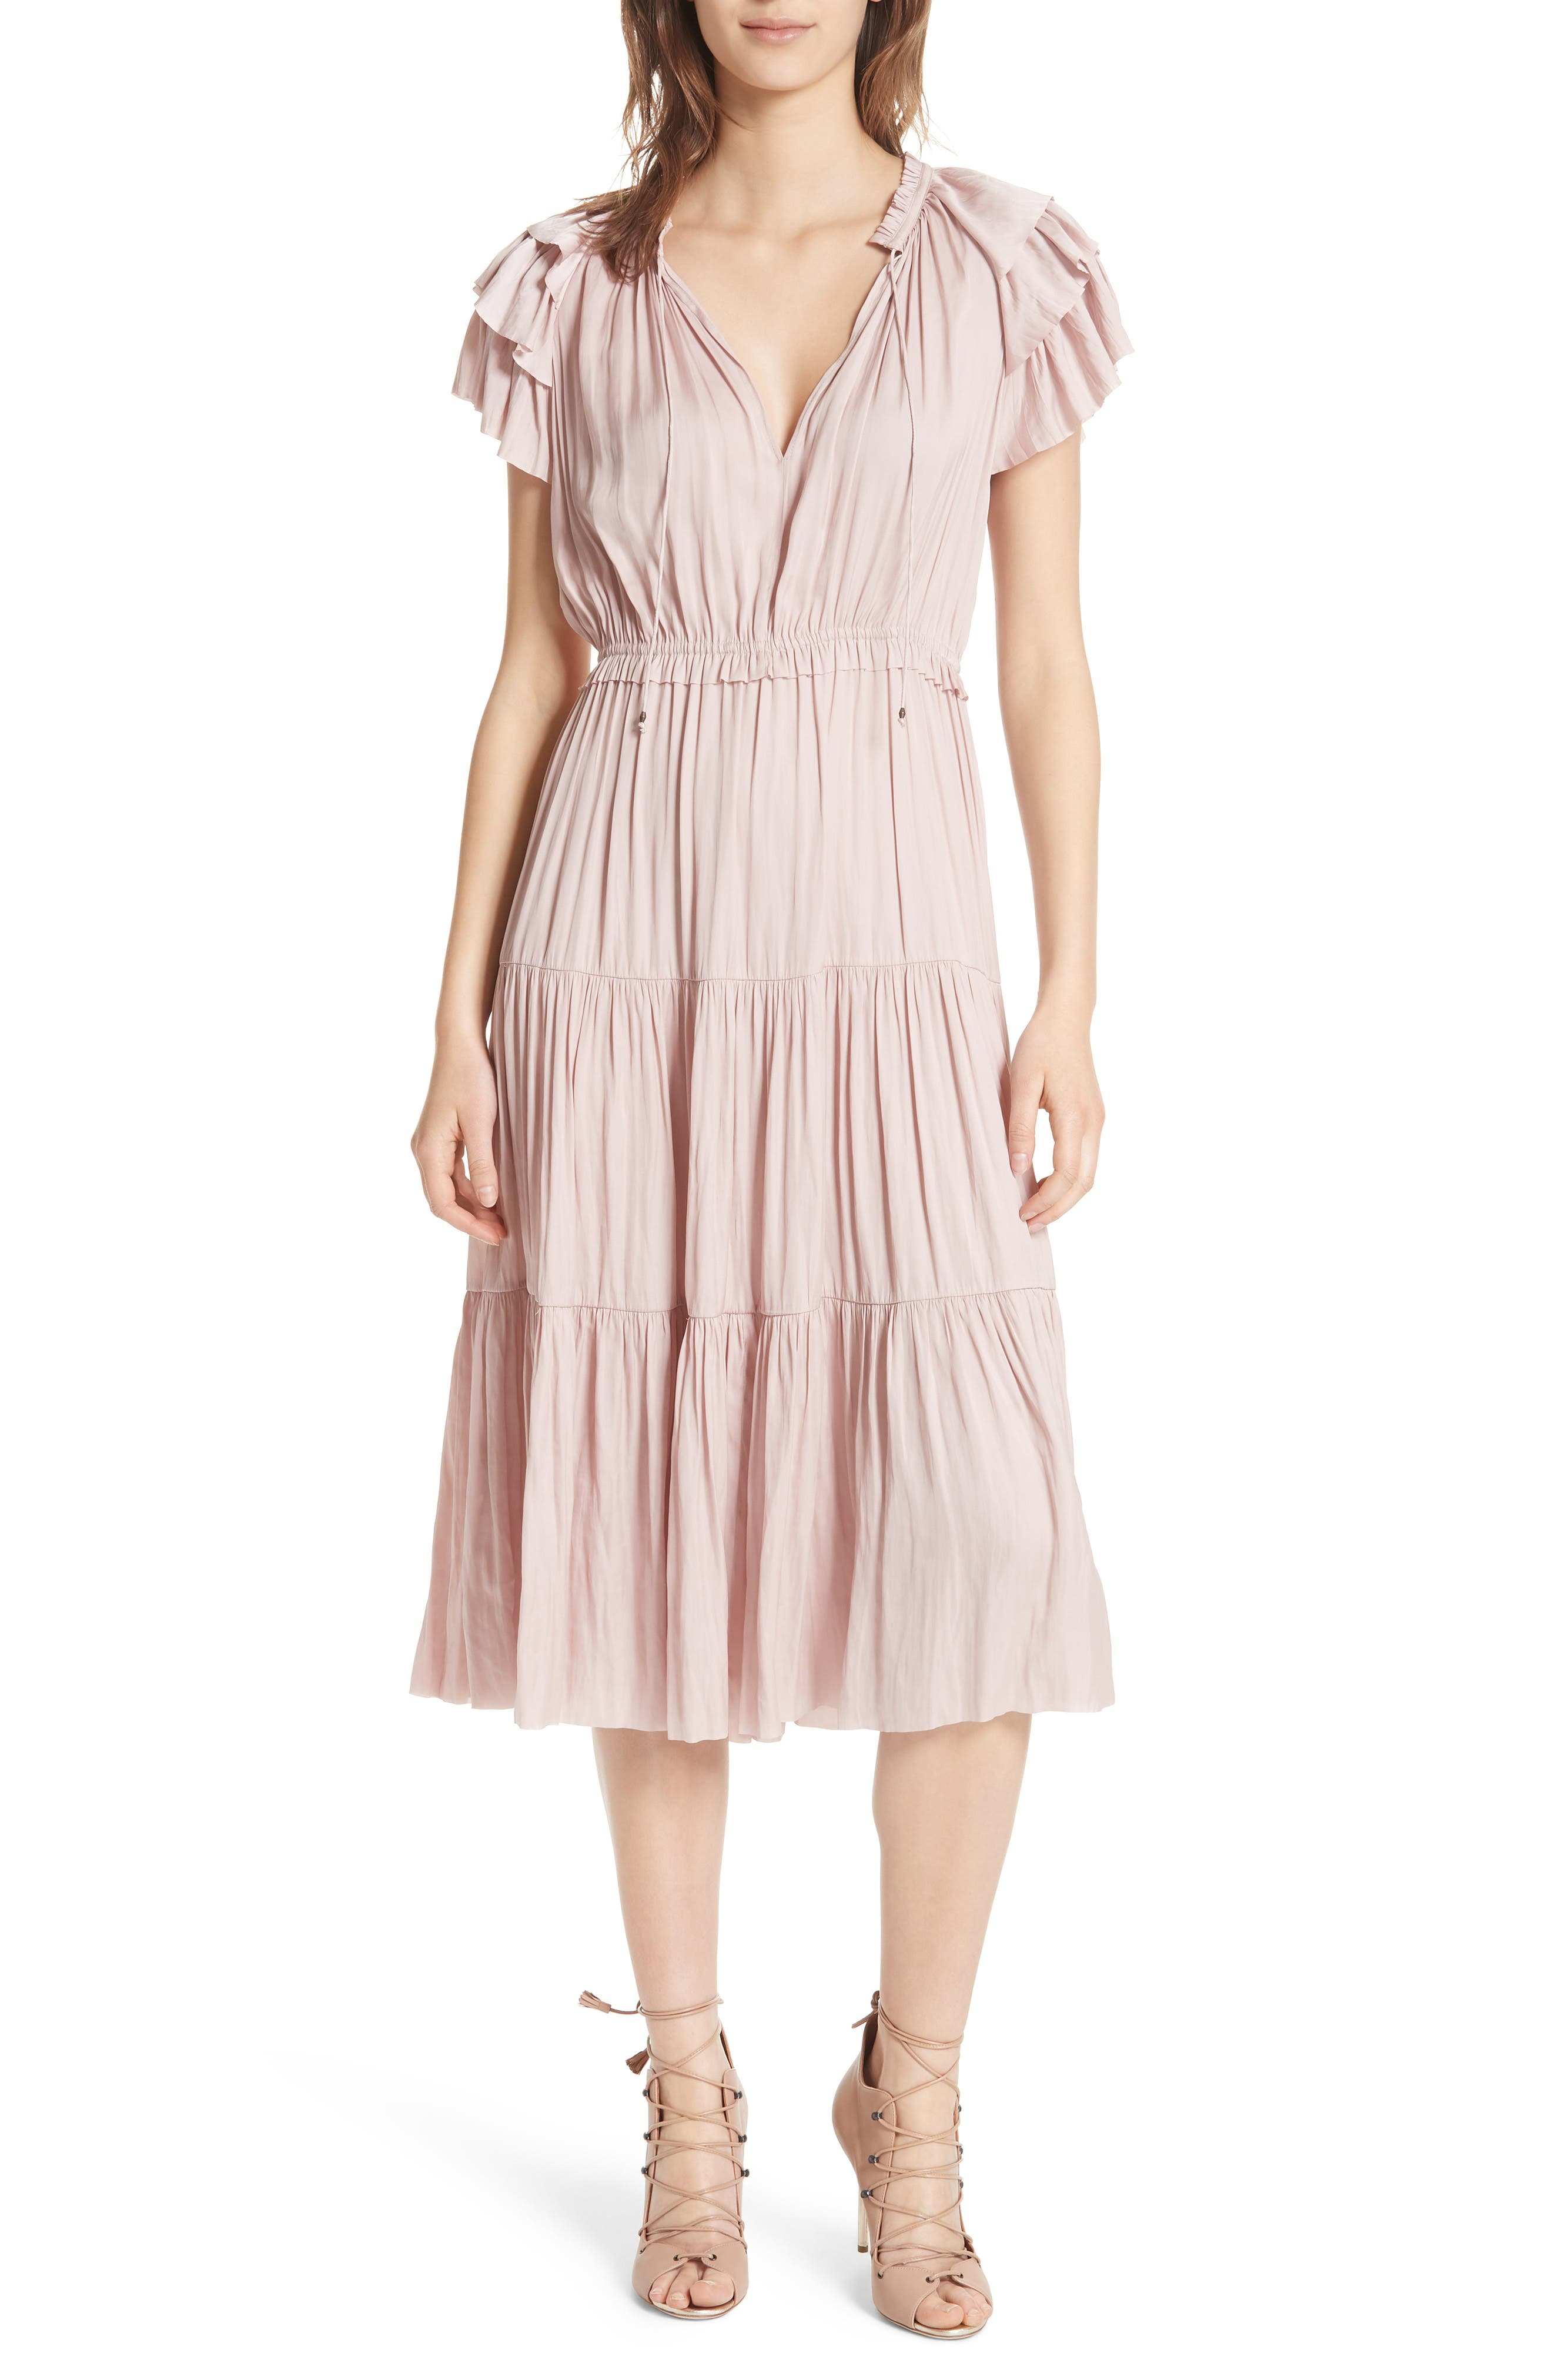 Blaire Satin Dress,                         Main,                         color, Rose